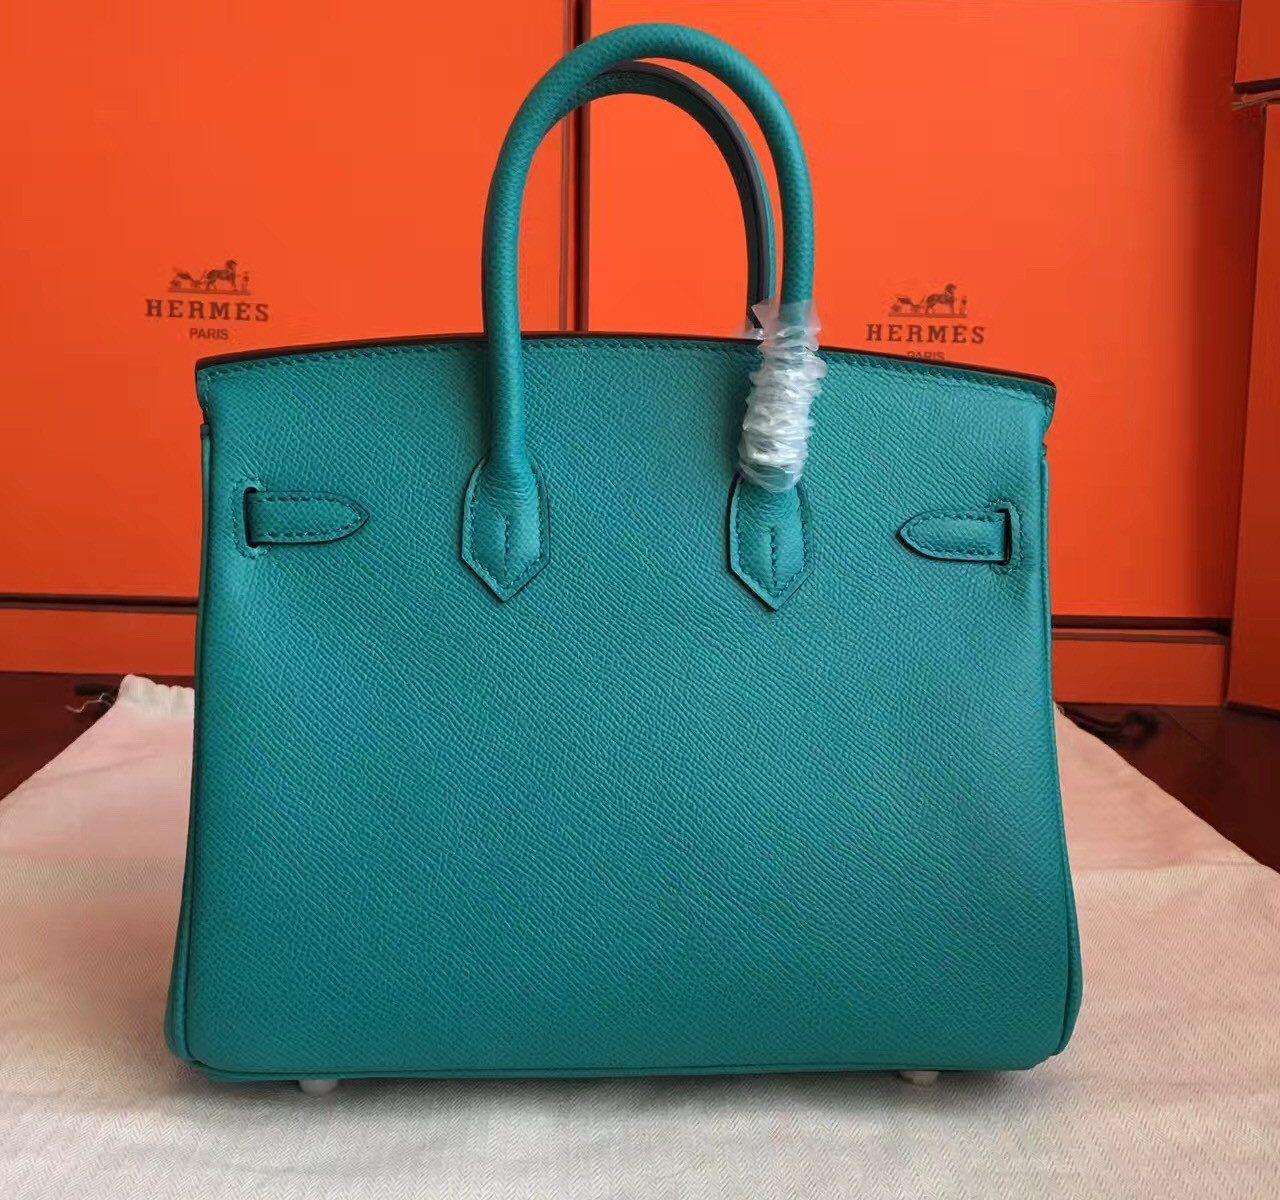 Replica Michael Kors Handbags